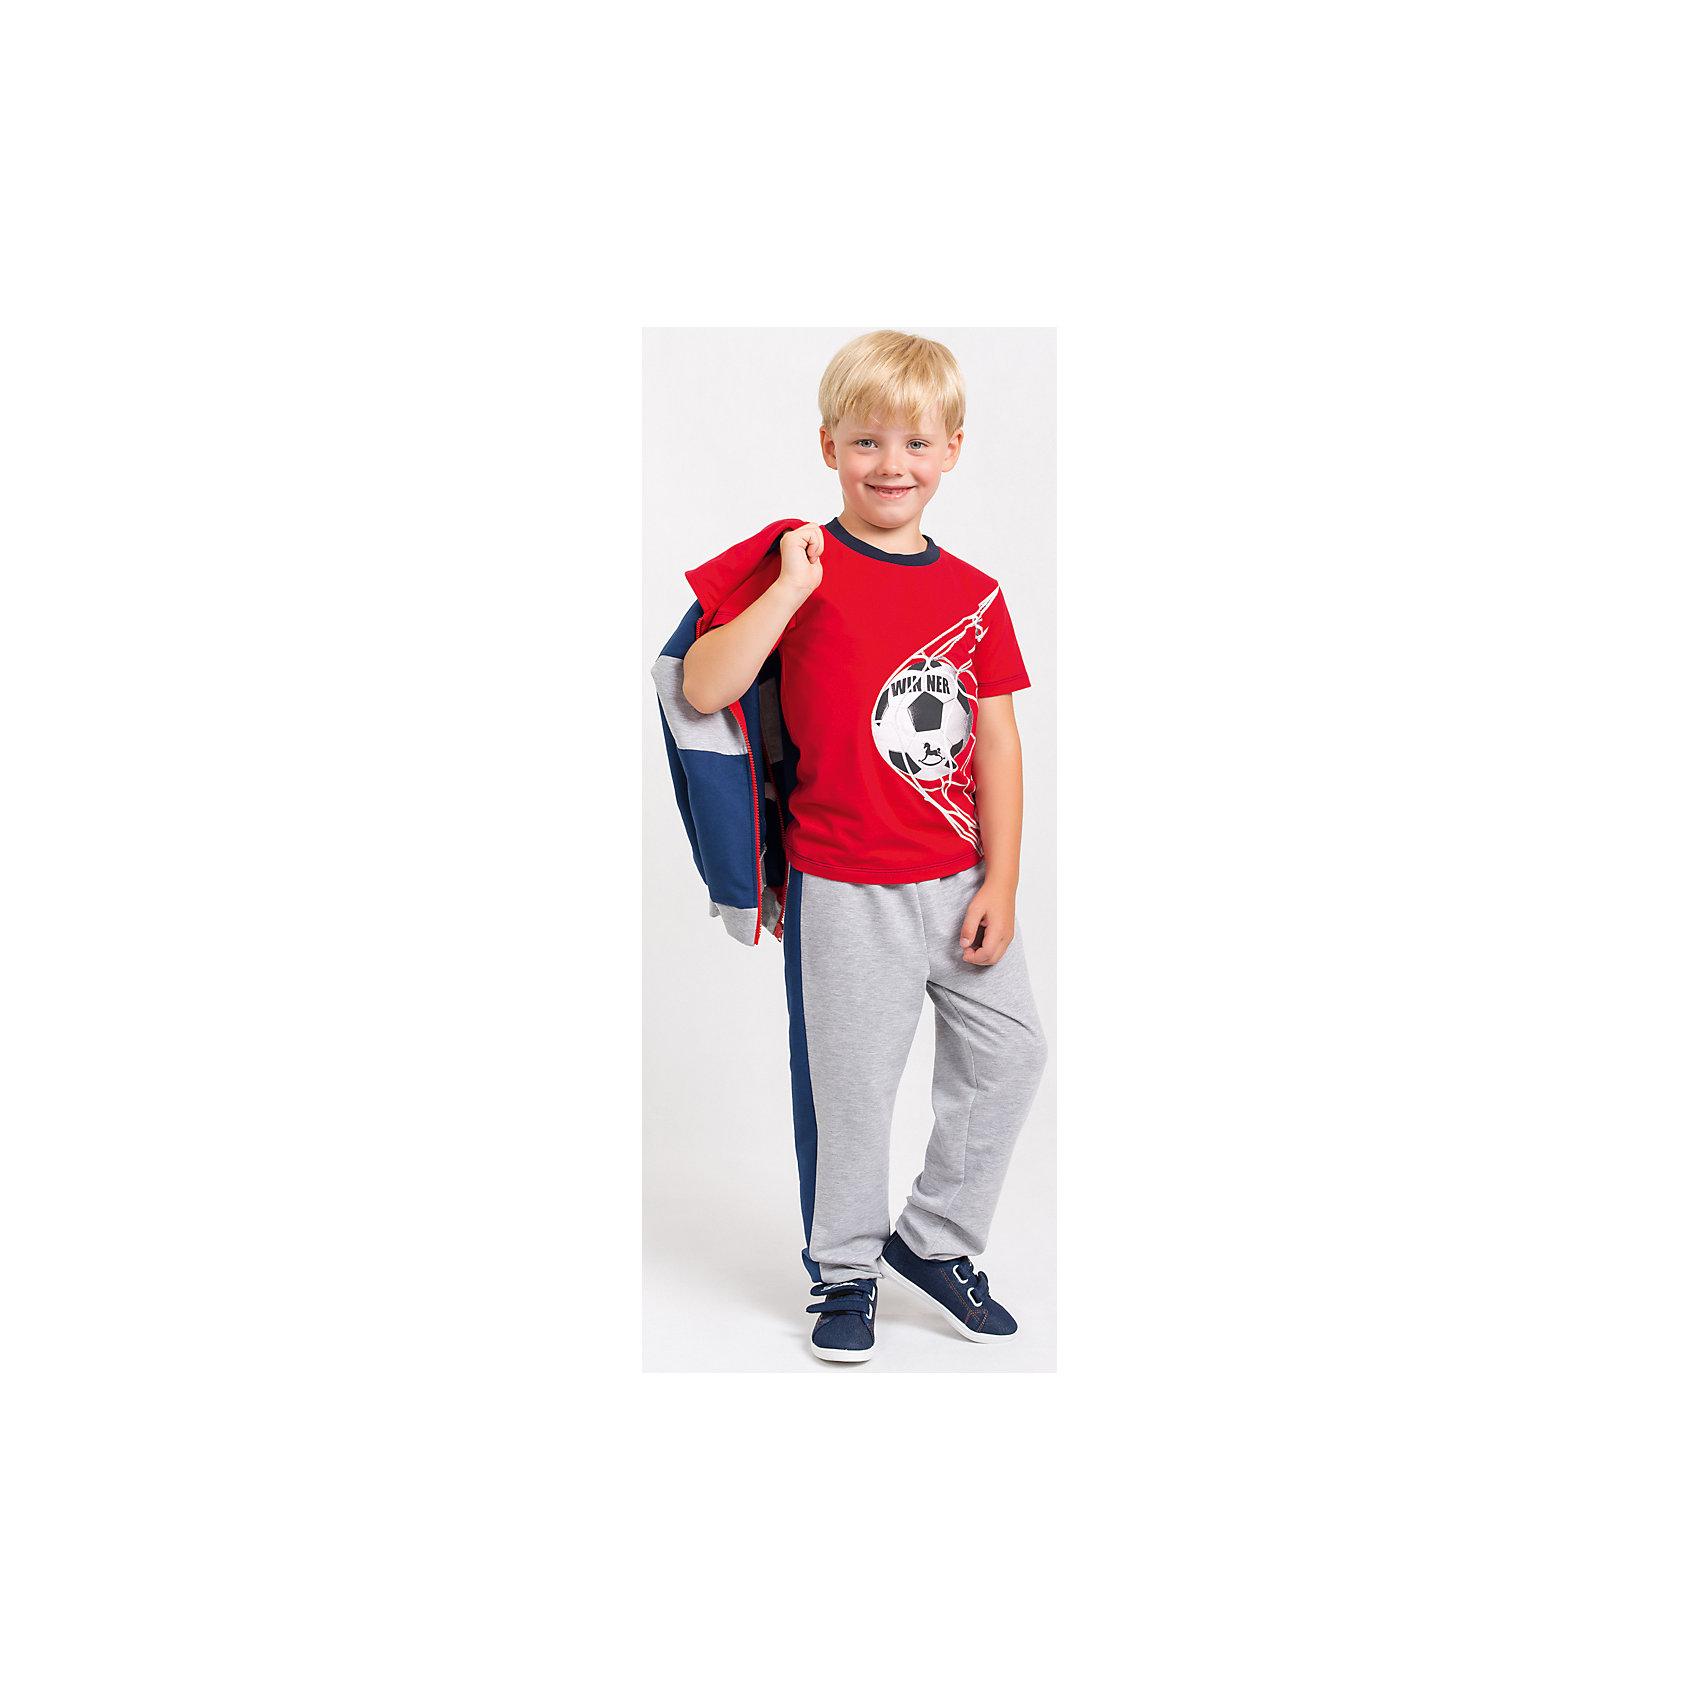 Футболка  для мальчикаФутболка для мальчика от белорусской марки Goldy.<br>Состав:<br>супрем компакт пенье (96% хлопок , 4% лайкра)<br><br>Ширина мм: 199<br>Глубина мм: 10<br>Высота мм: 161<br>Вес г: 151<br>Цвет: красный<br>Возраст от месяцев: 18<br>Возраст до месяцев: 24<br>Пол: Мужской<br>Возраст: Детский<br>Размер: 92,104,98,122,116,110<br>SKU: 4921146